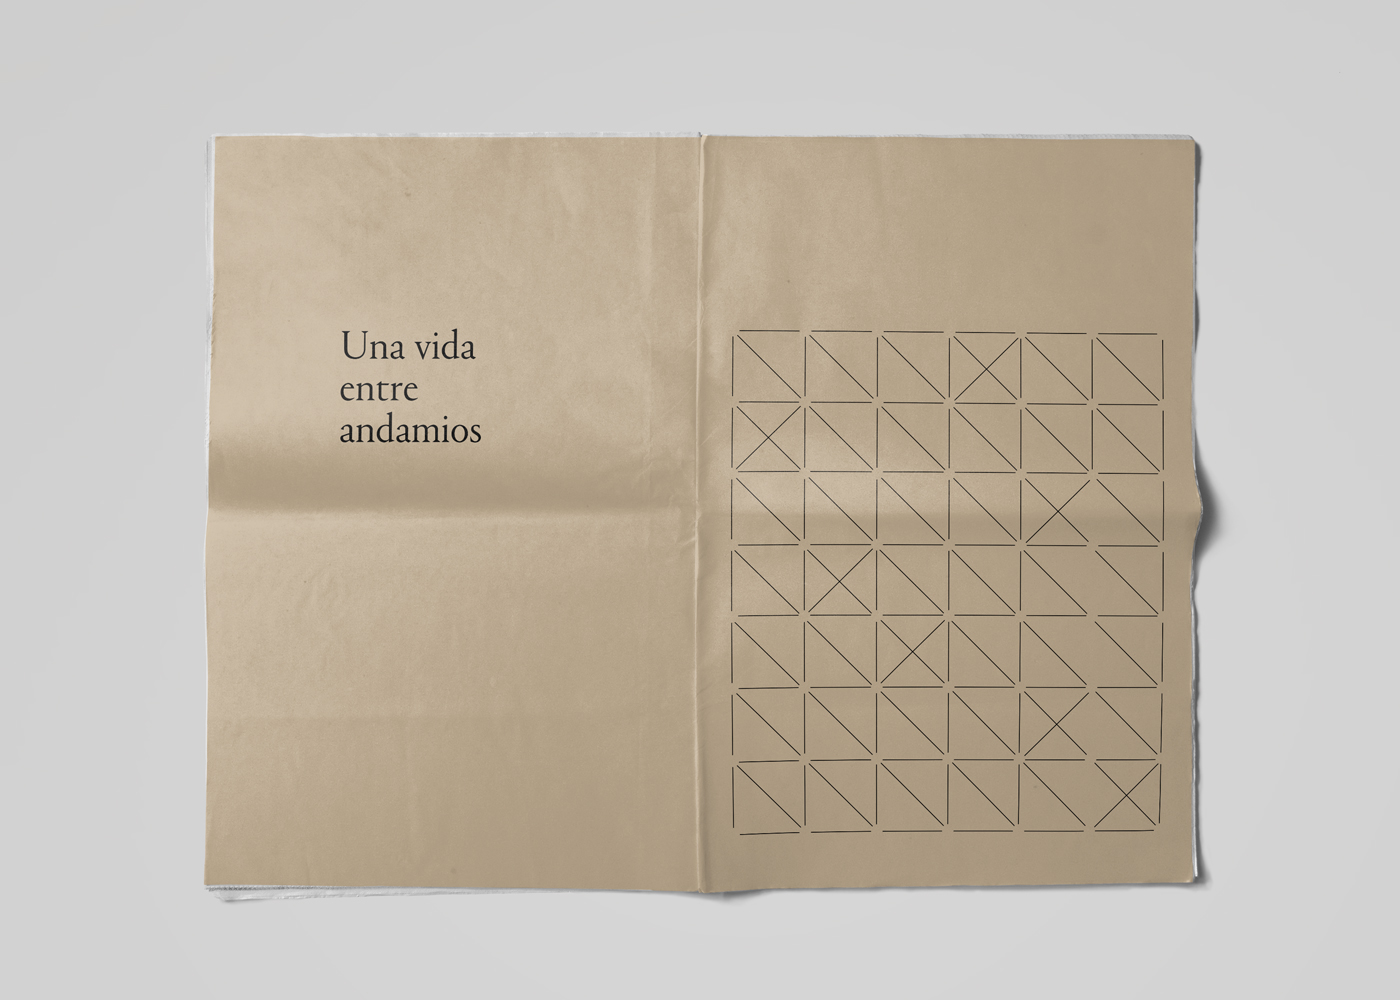 Buenaventura estudio Pedro Salmeron 07